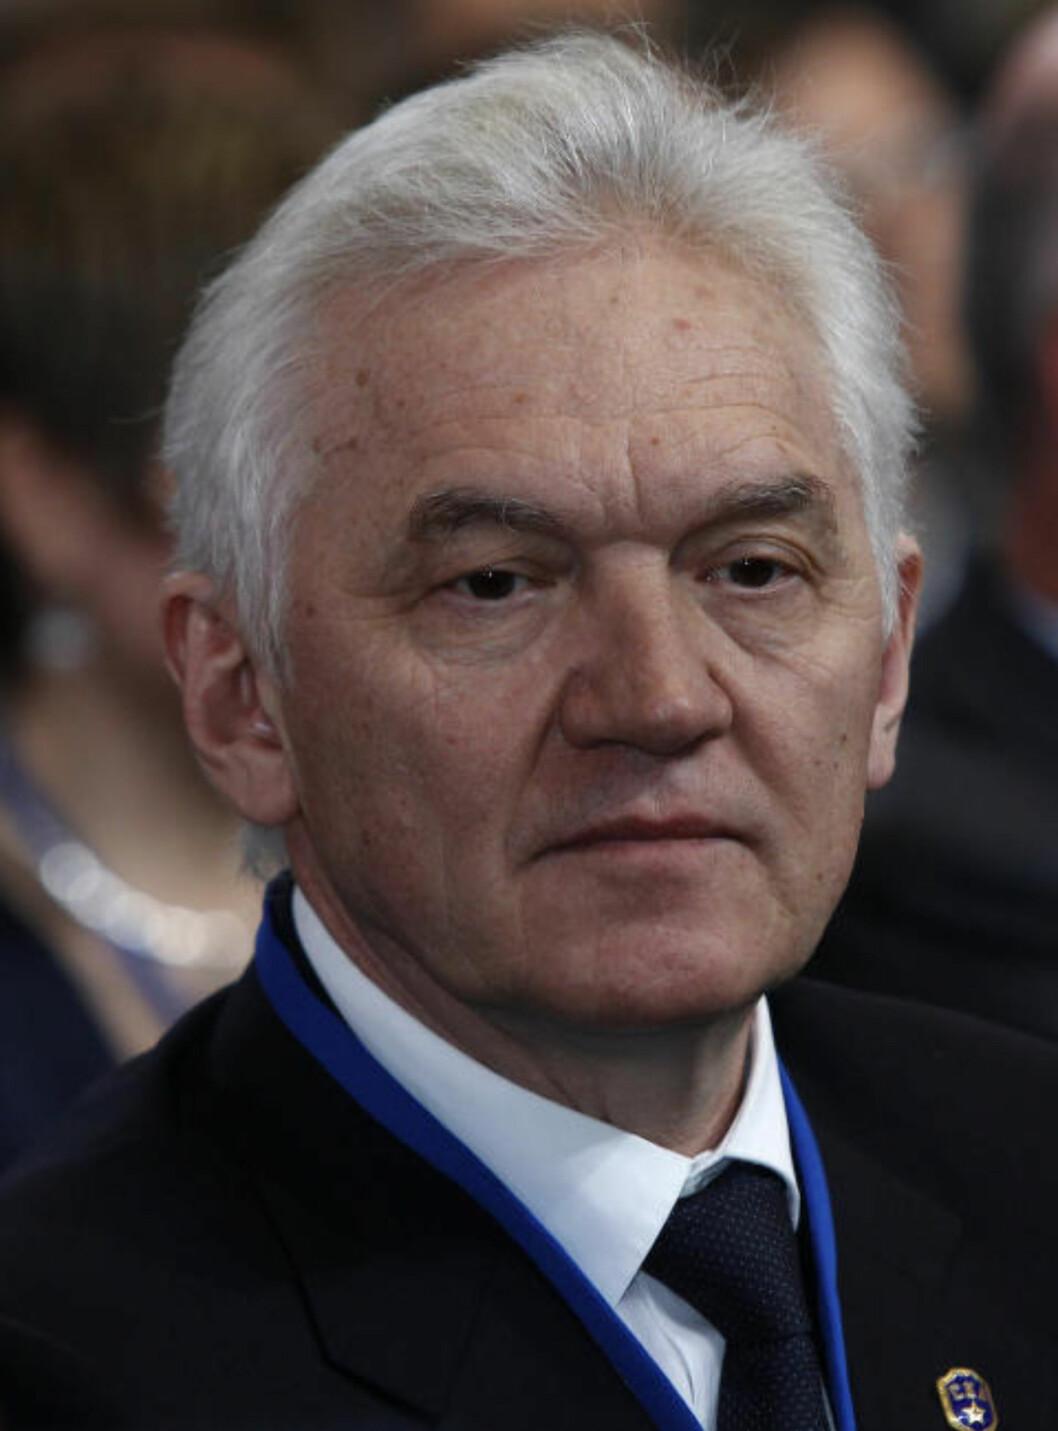 MEKTIG: Milliardæren Gennadij Timsjenko har tette bånd til Russlands president Vladimir Putin. Foto: Reuters/Alexander Demianchuk/NTB Scanpix